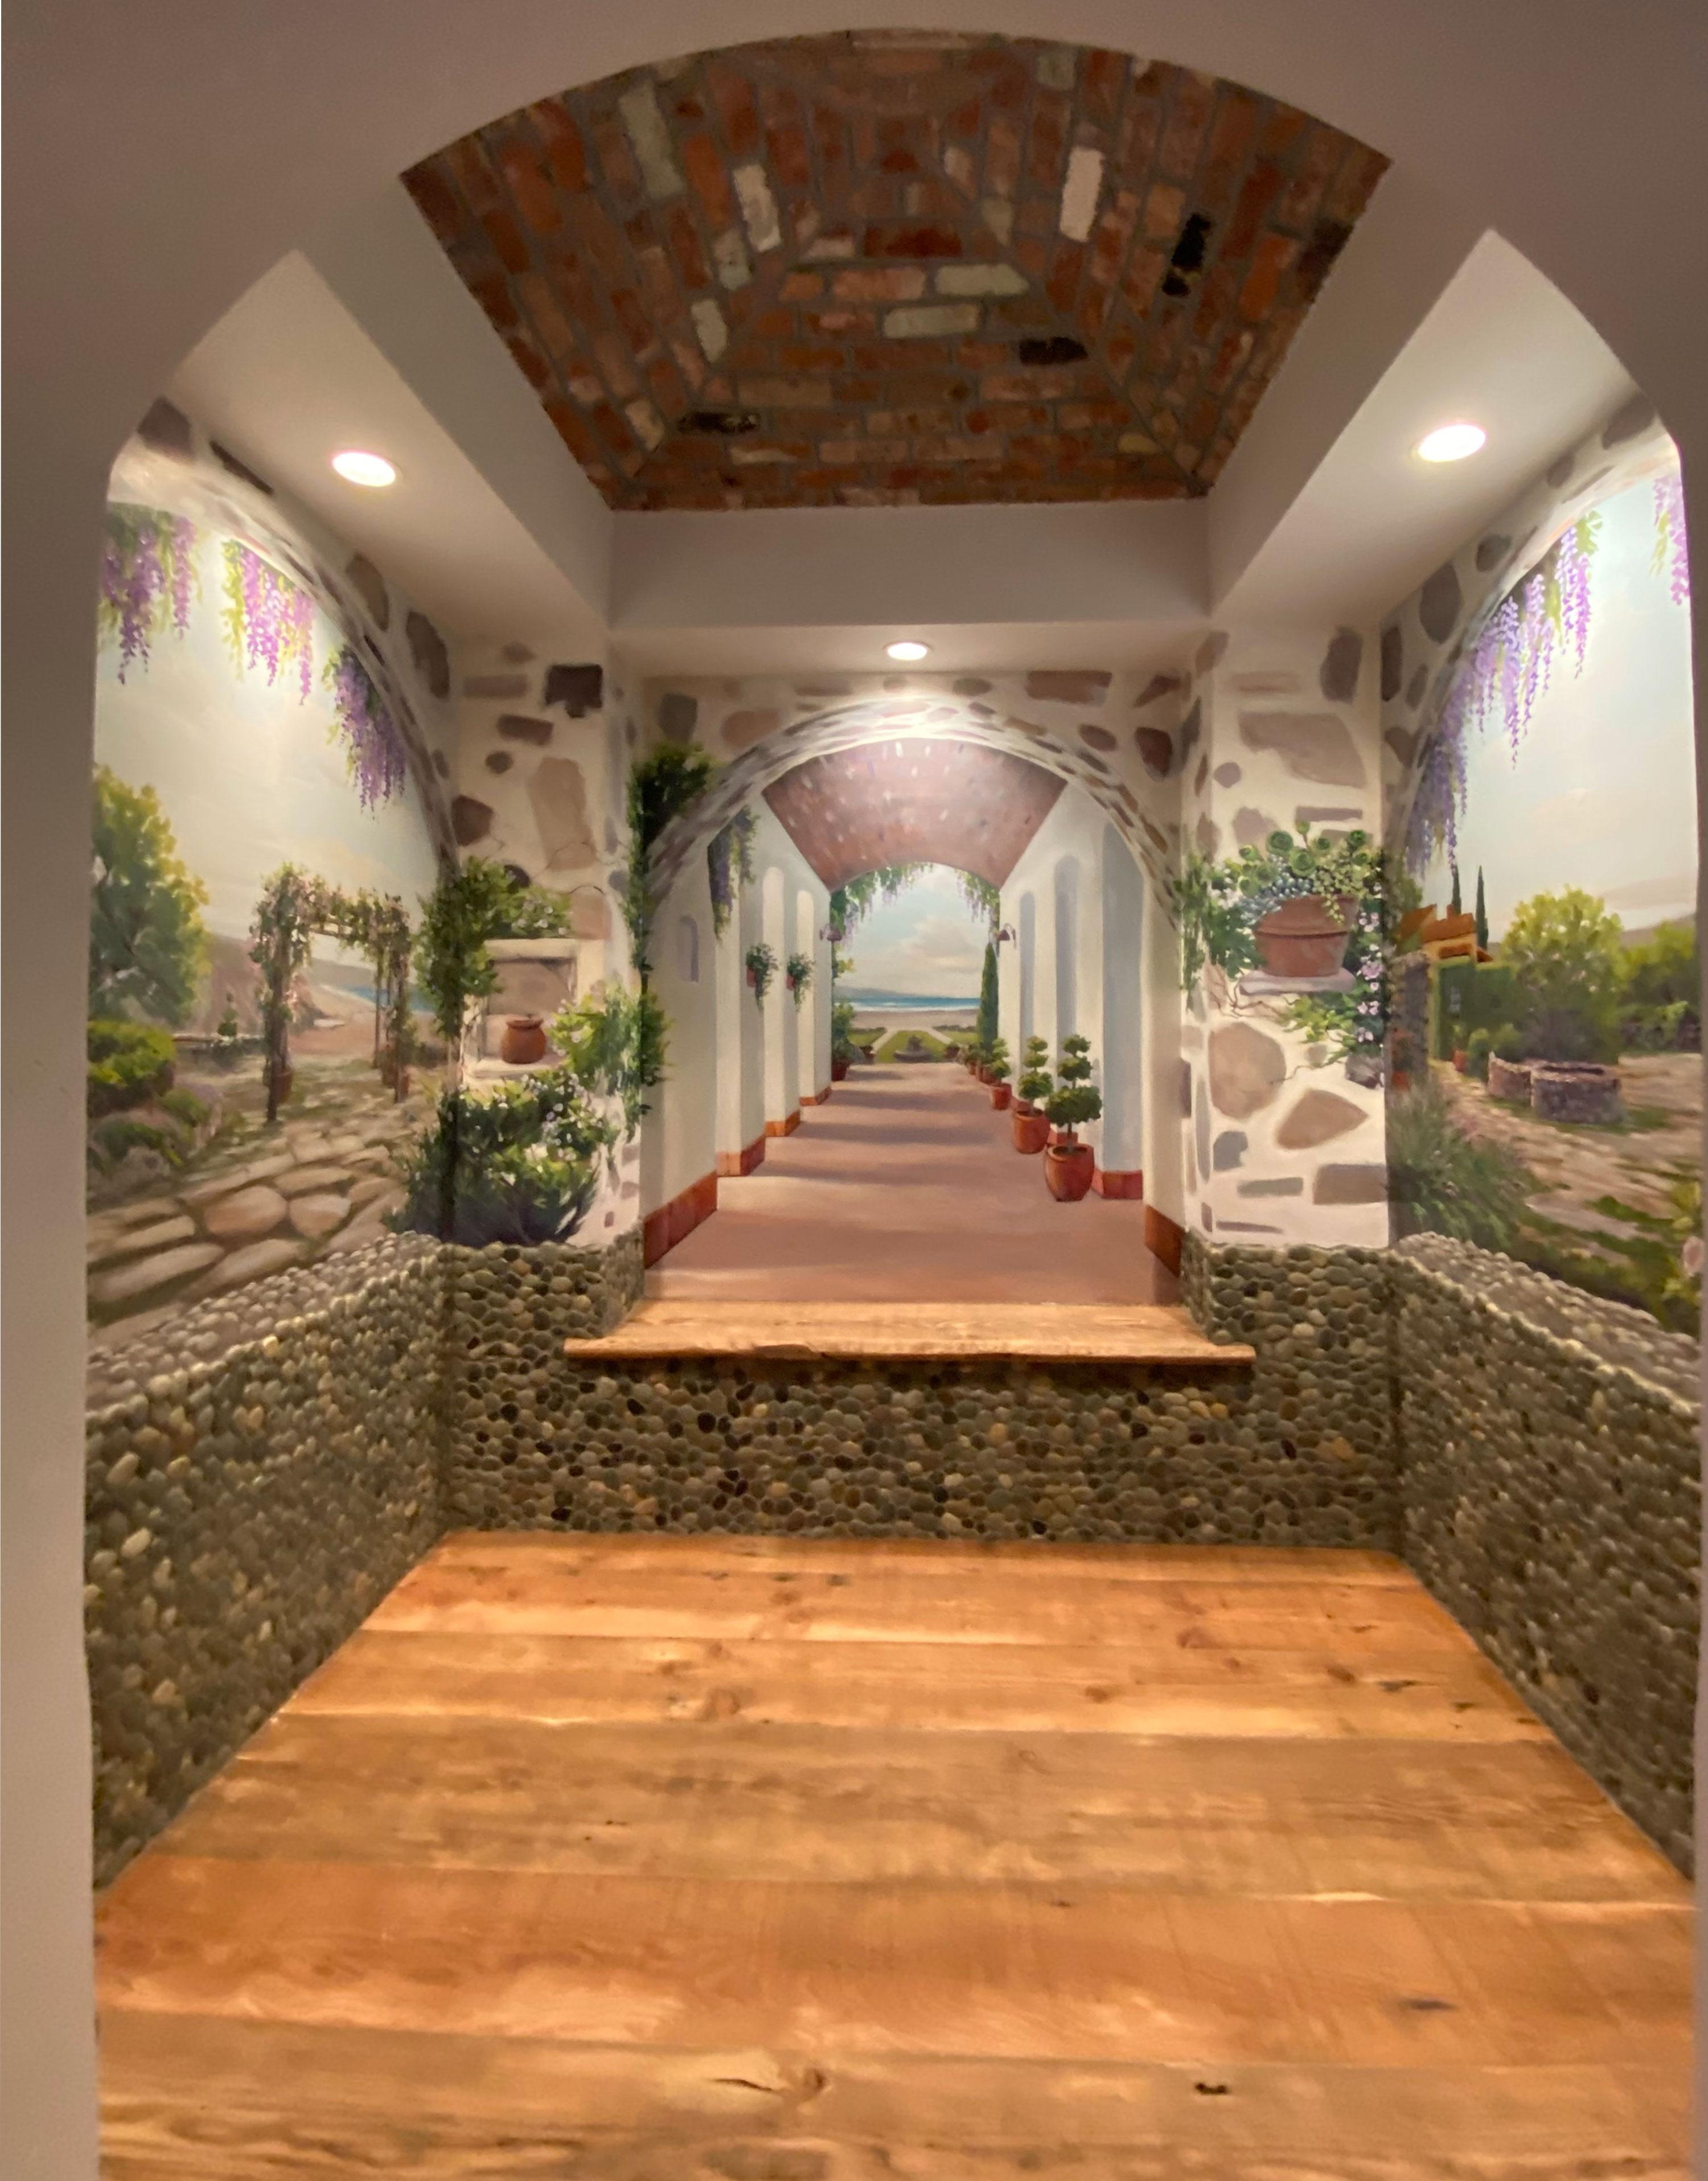 Italian Trompe l'oeil Mural Painting in Northern California Residence